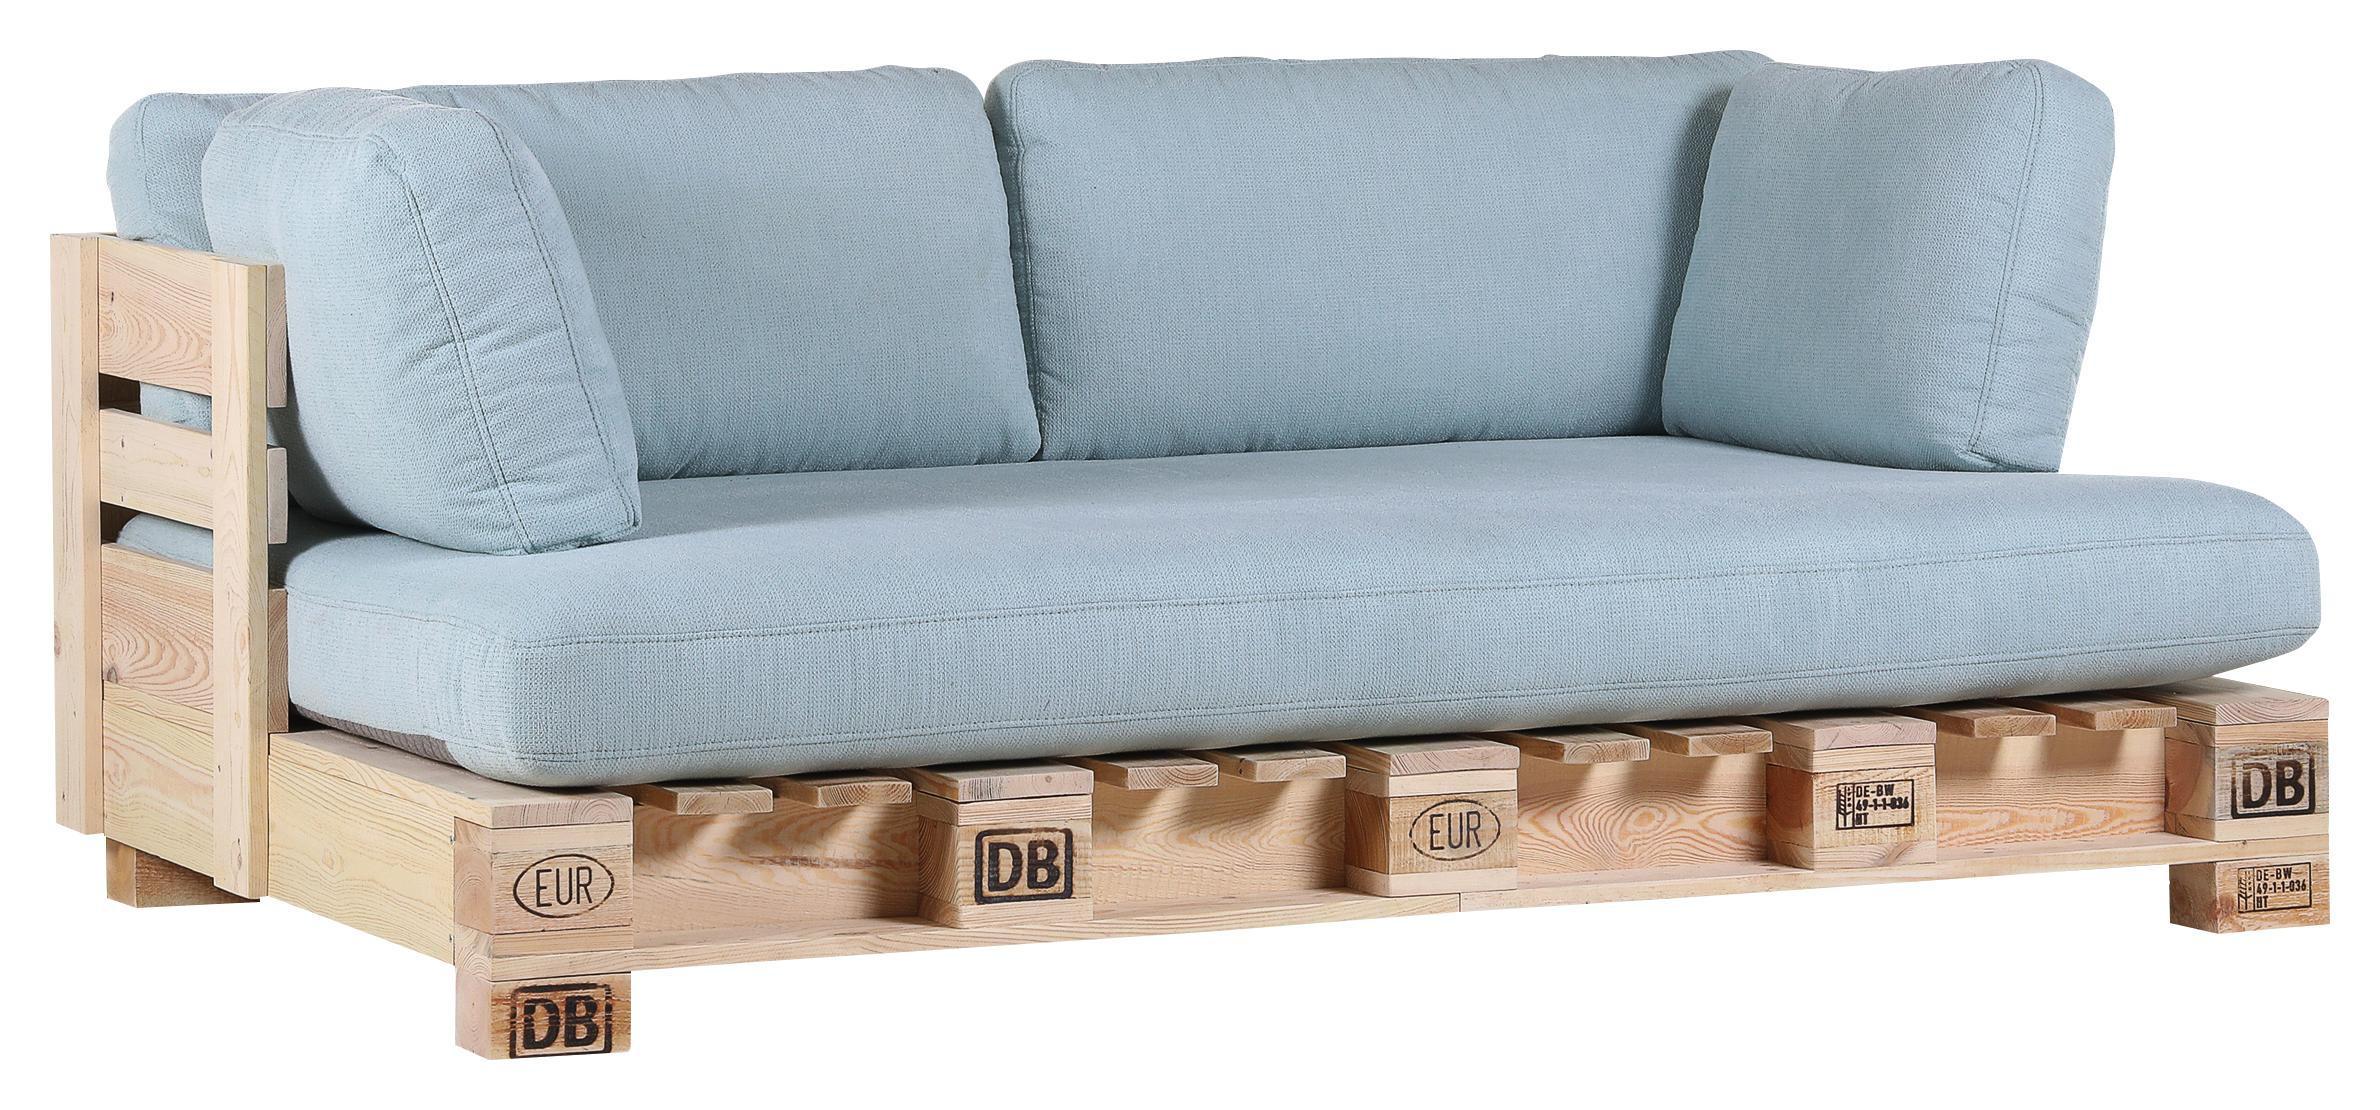 SOFA Hellblau, Naturfarben   Naturfarben/Hellblau, Design, Holz/Textil (204